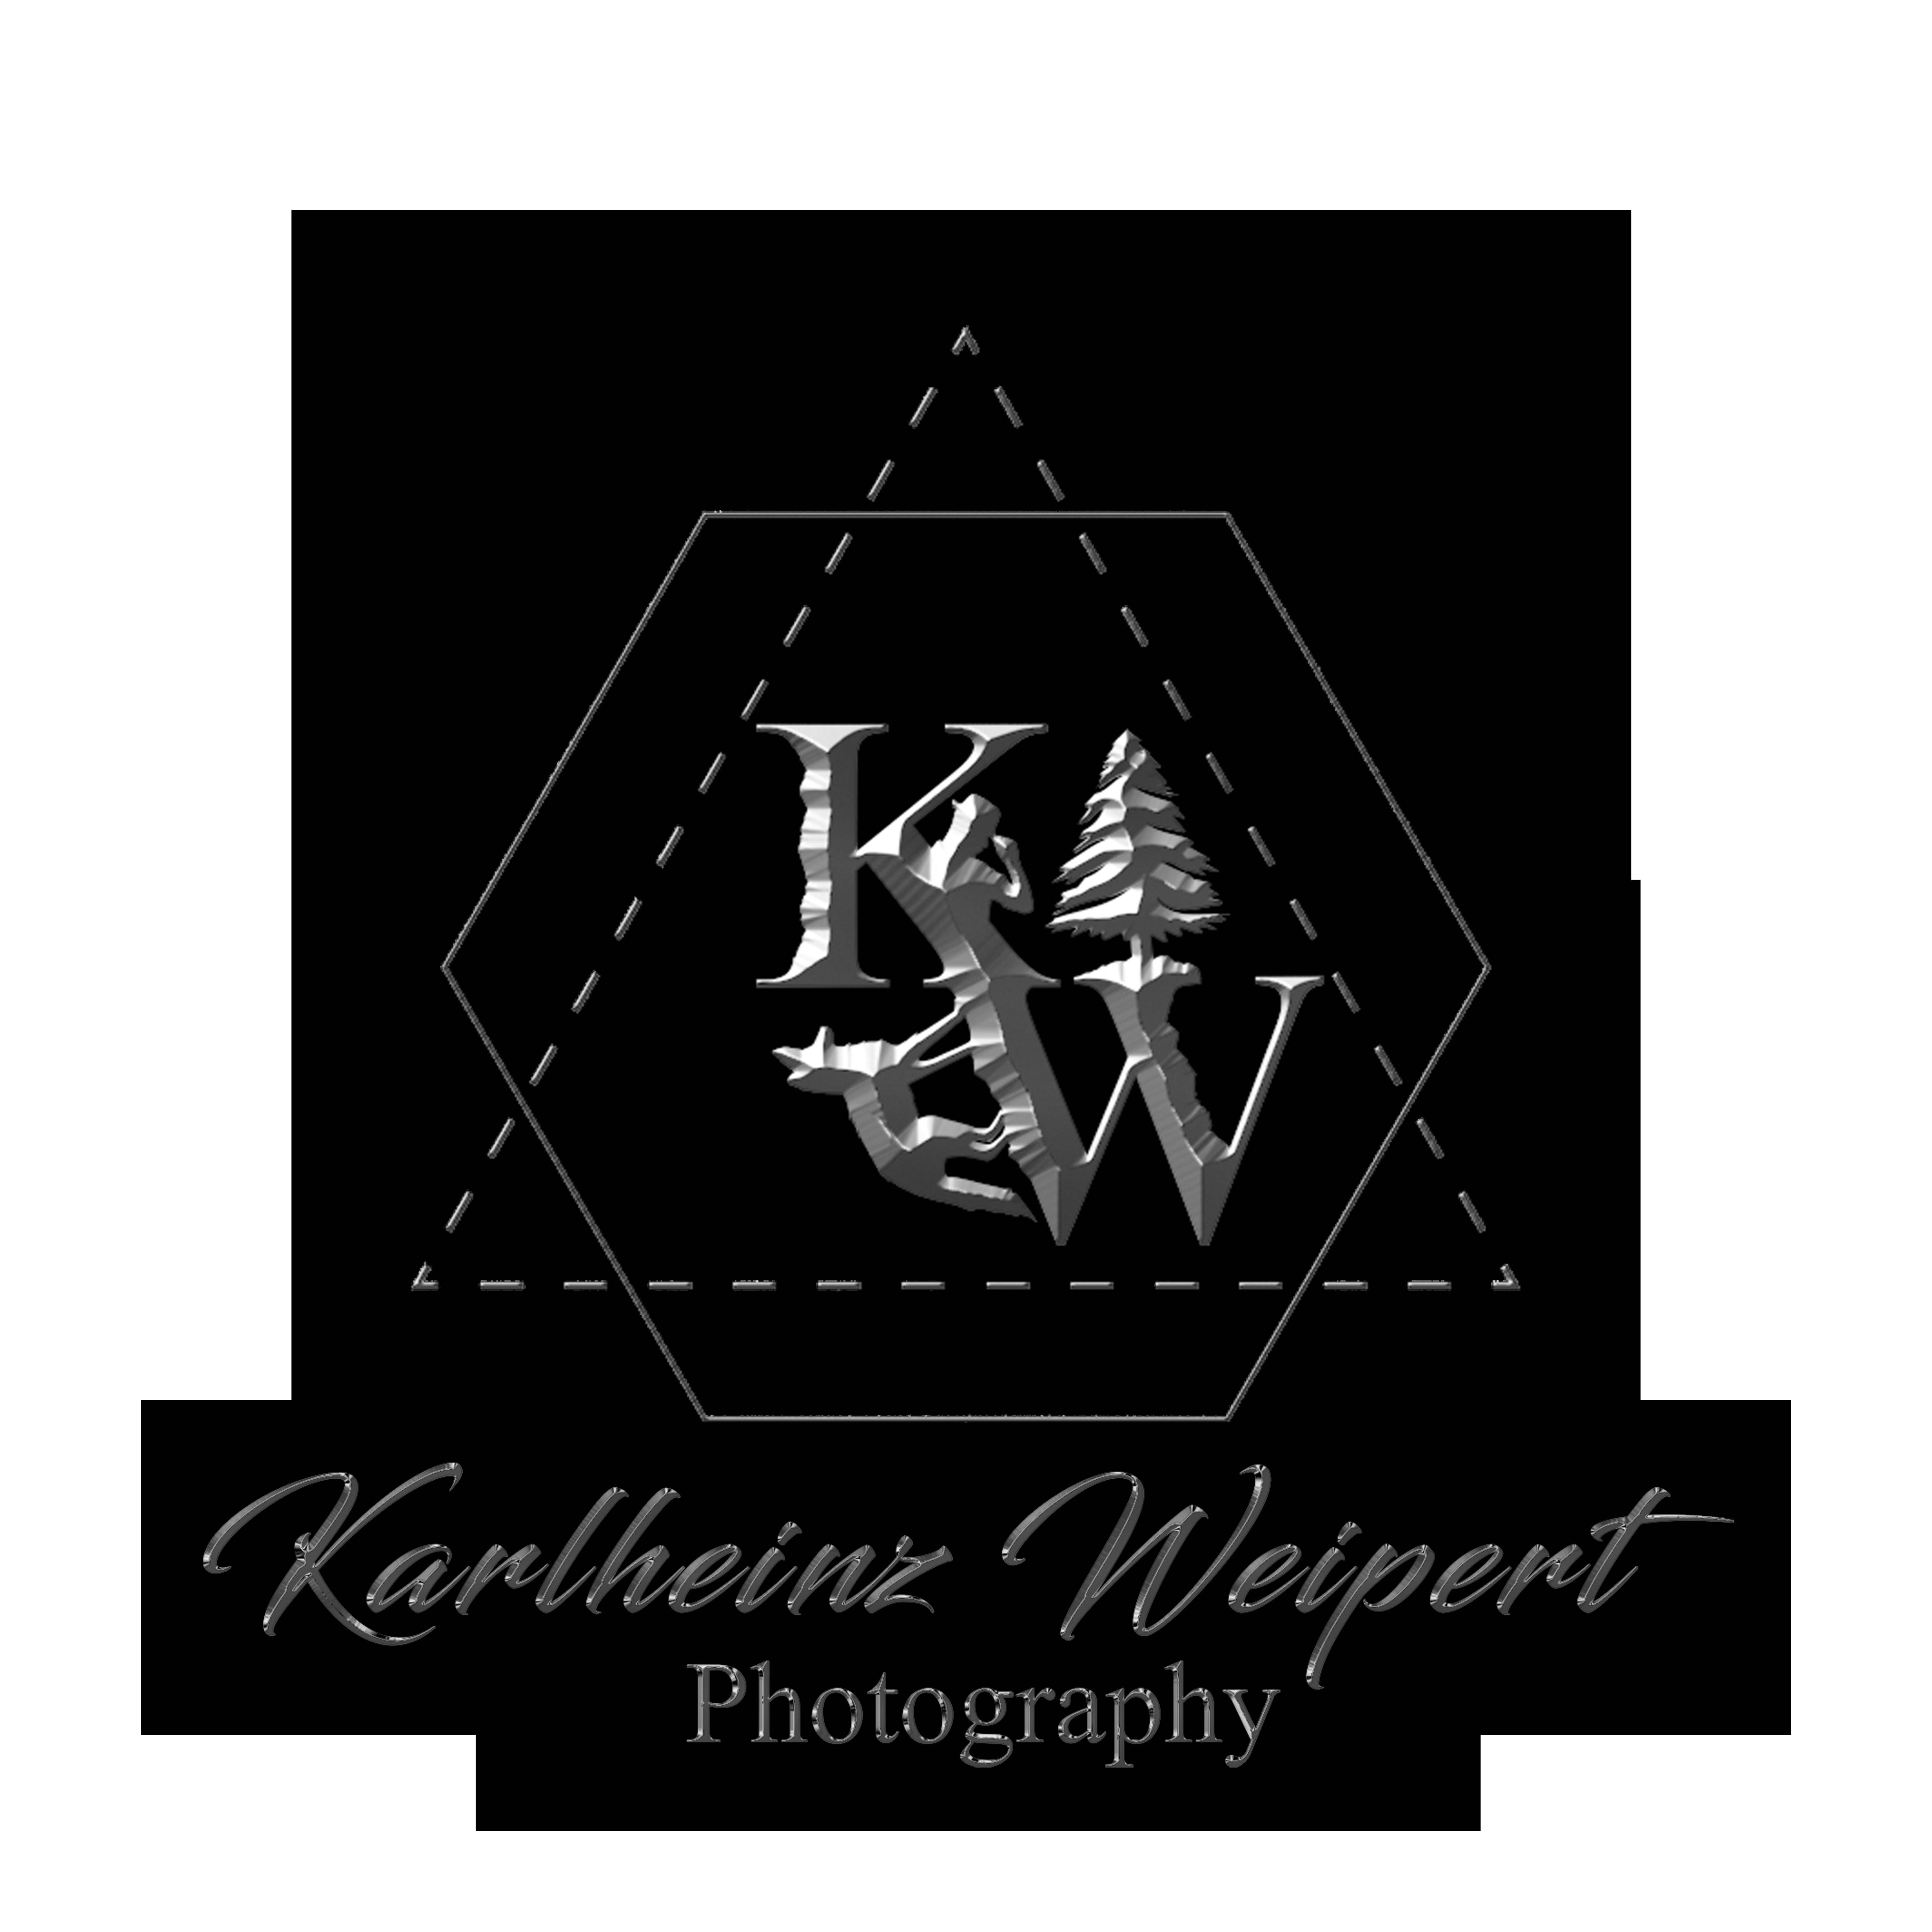 Karlheinz Weipert Photography